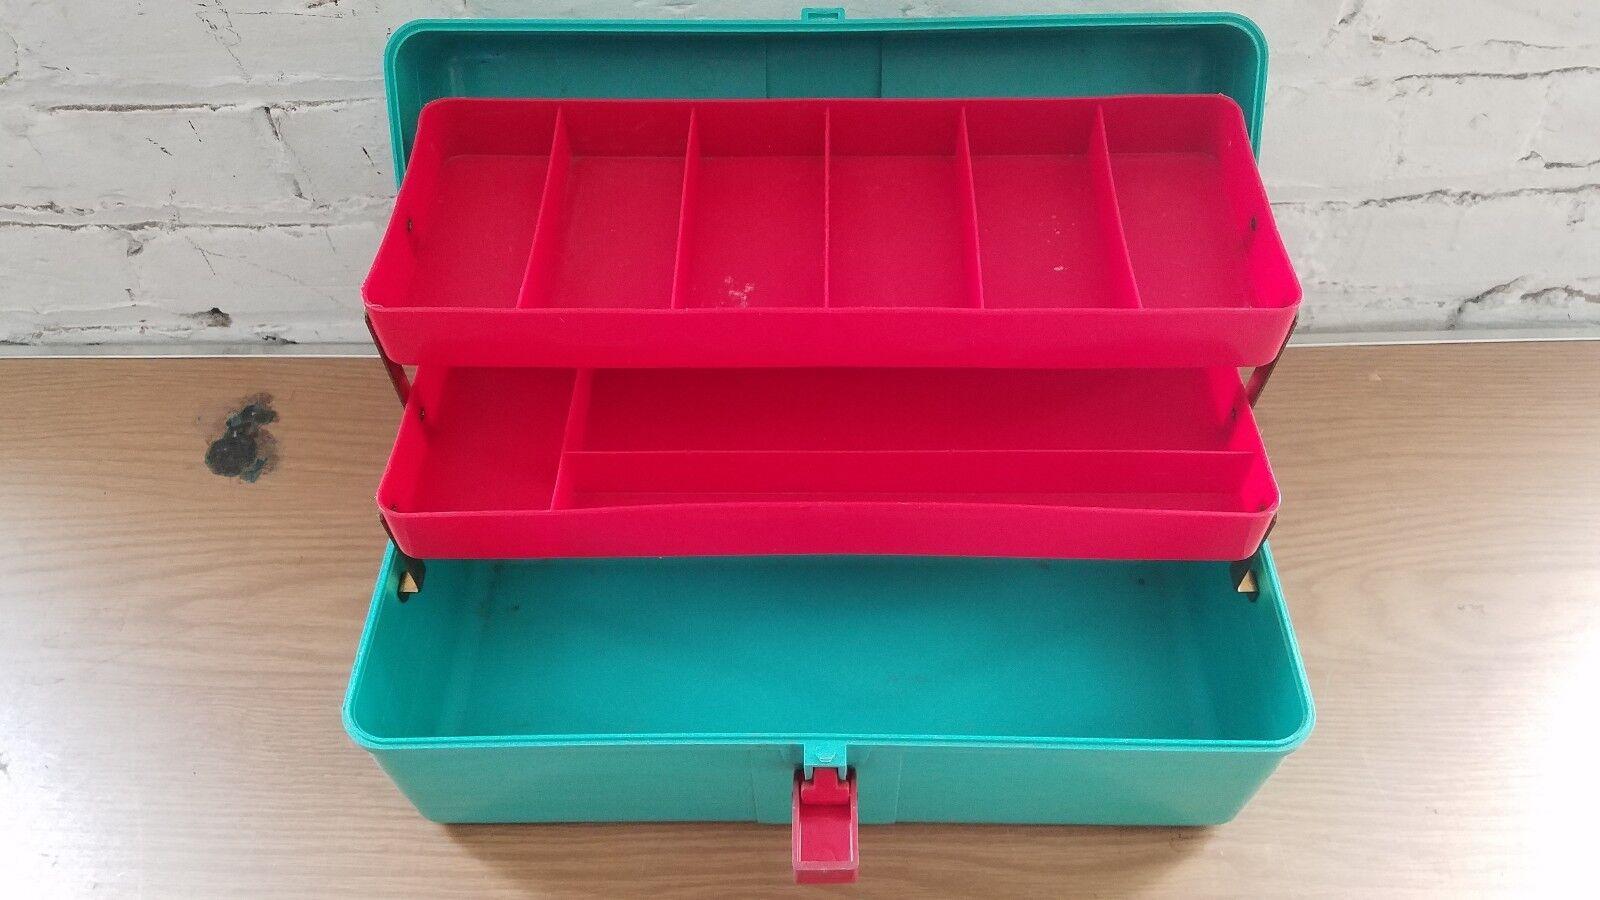 verde Azulado &  rojo mi amigo Nº 852 Caja De Pesca  mejor calidad